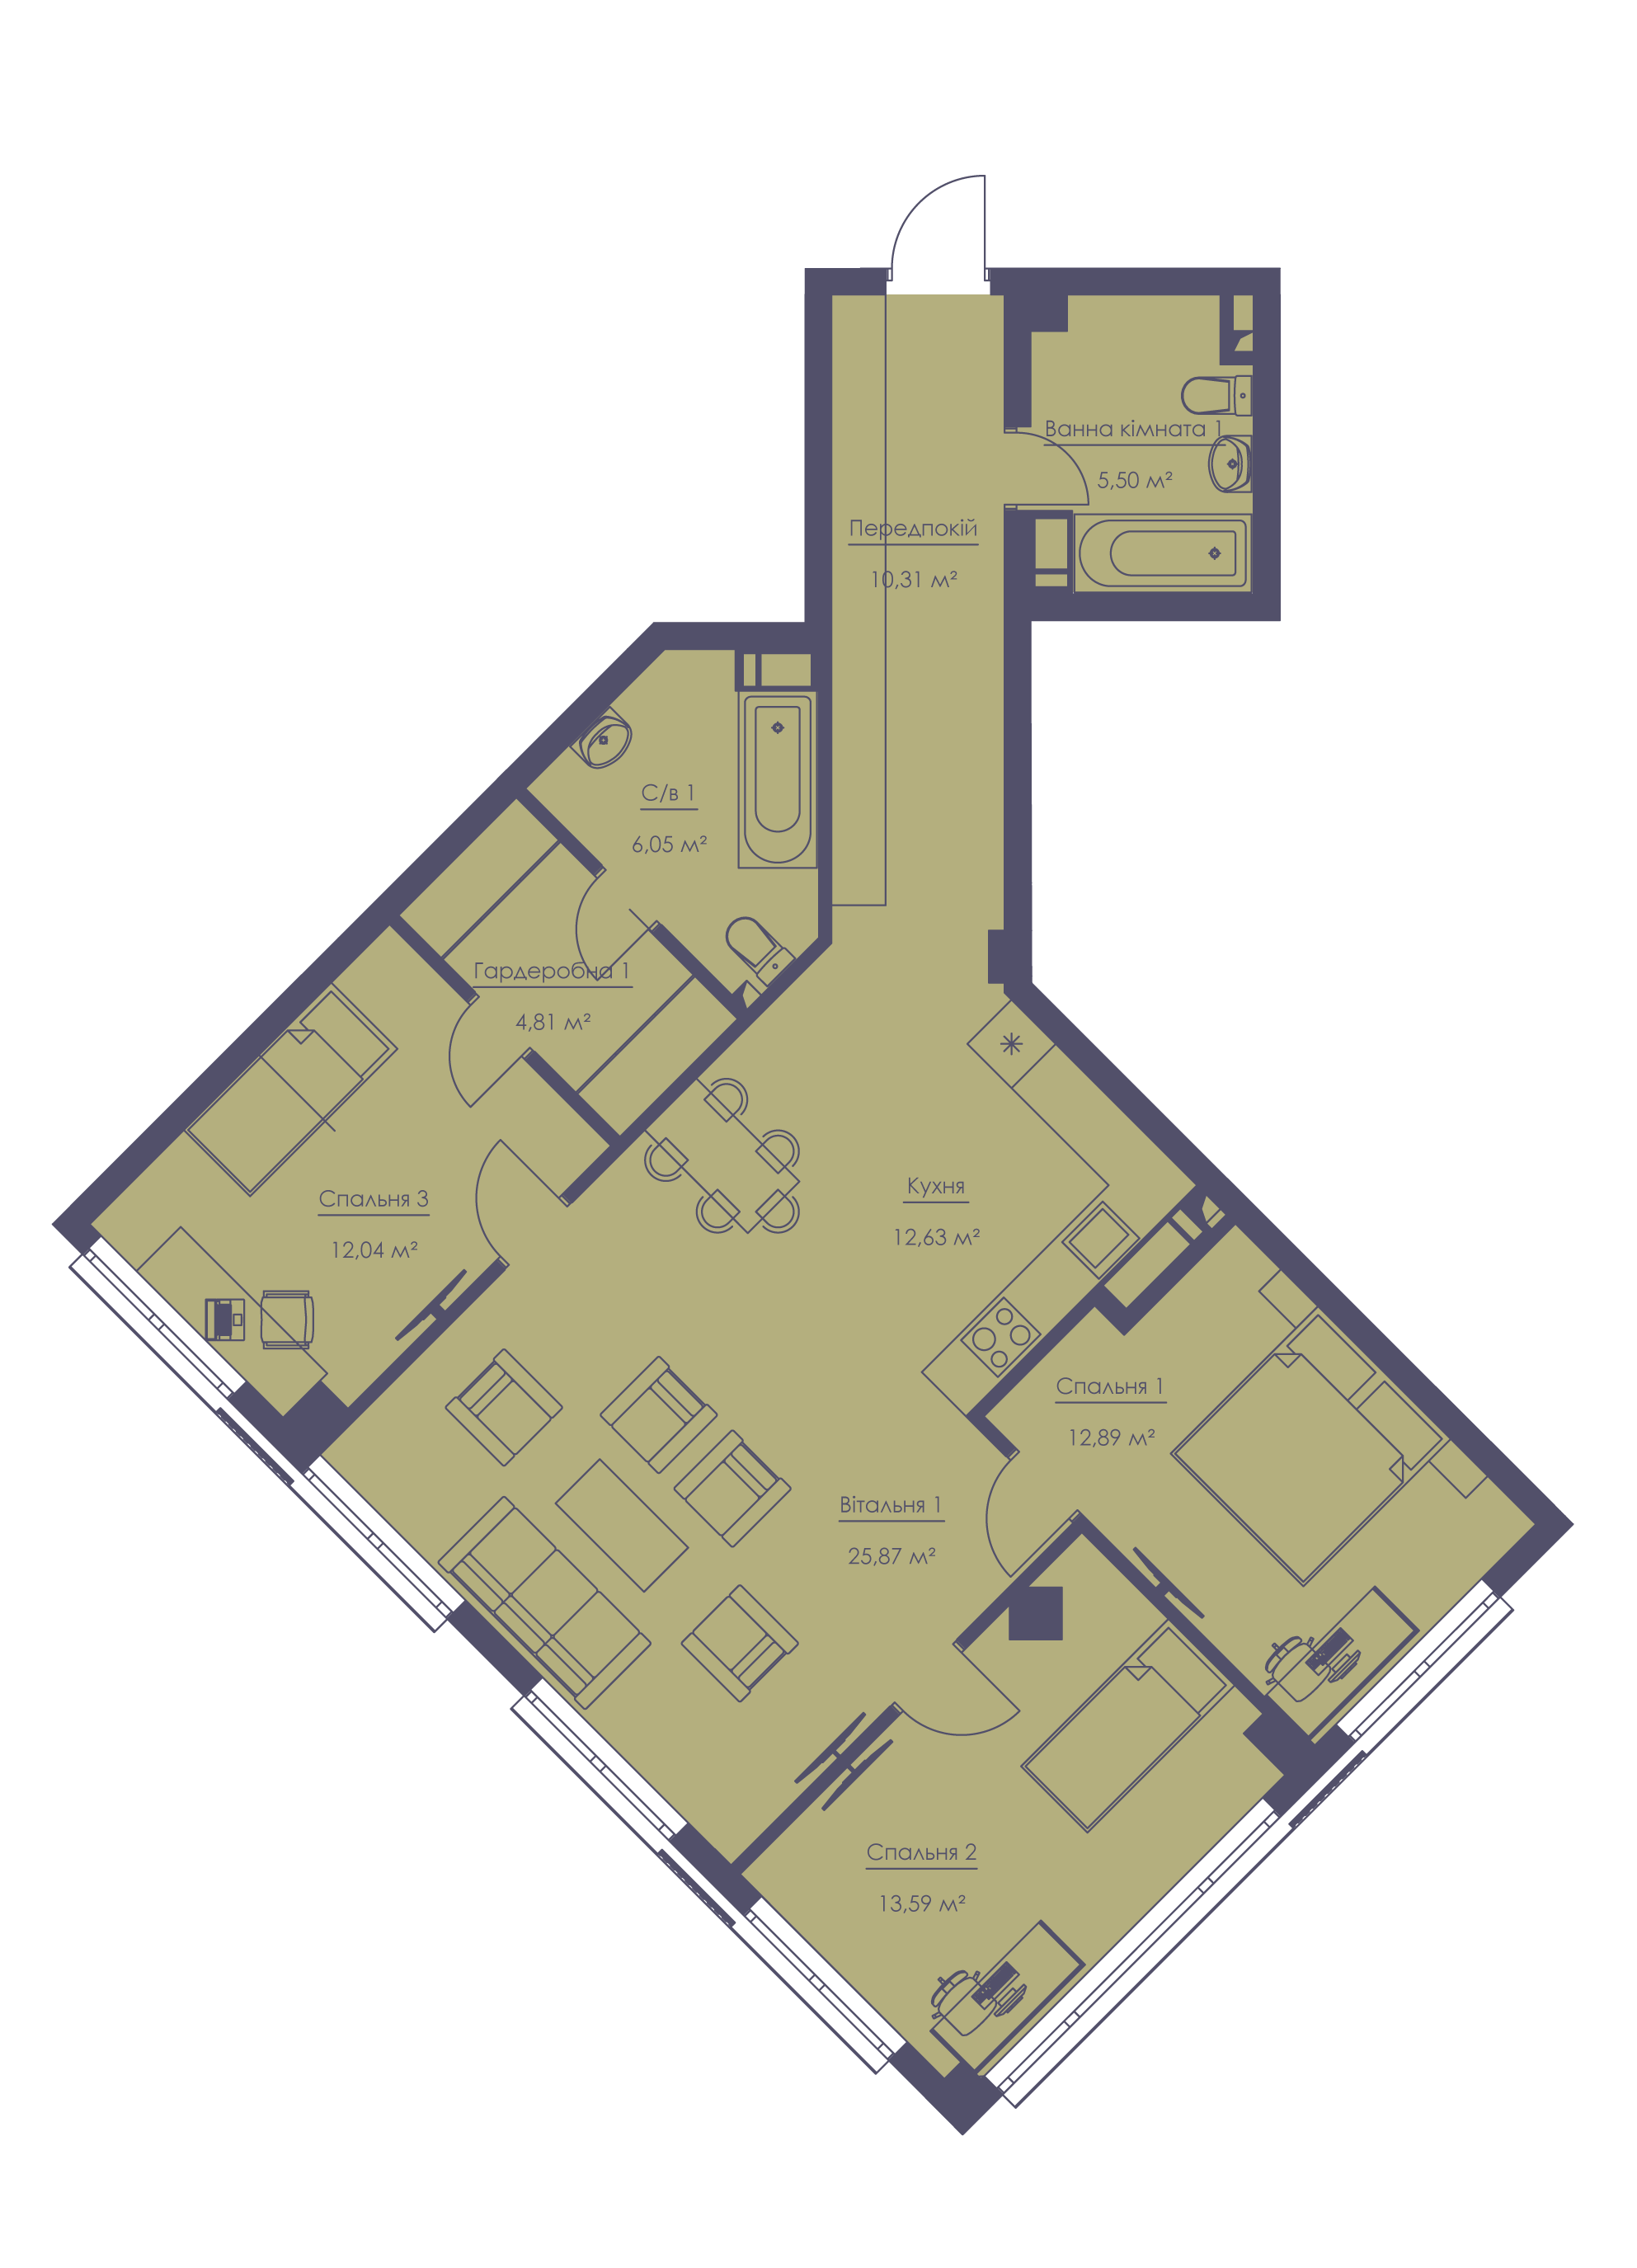 Apartment layout KV_39_4a_1_1_2-1